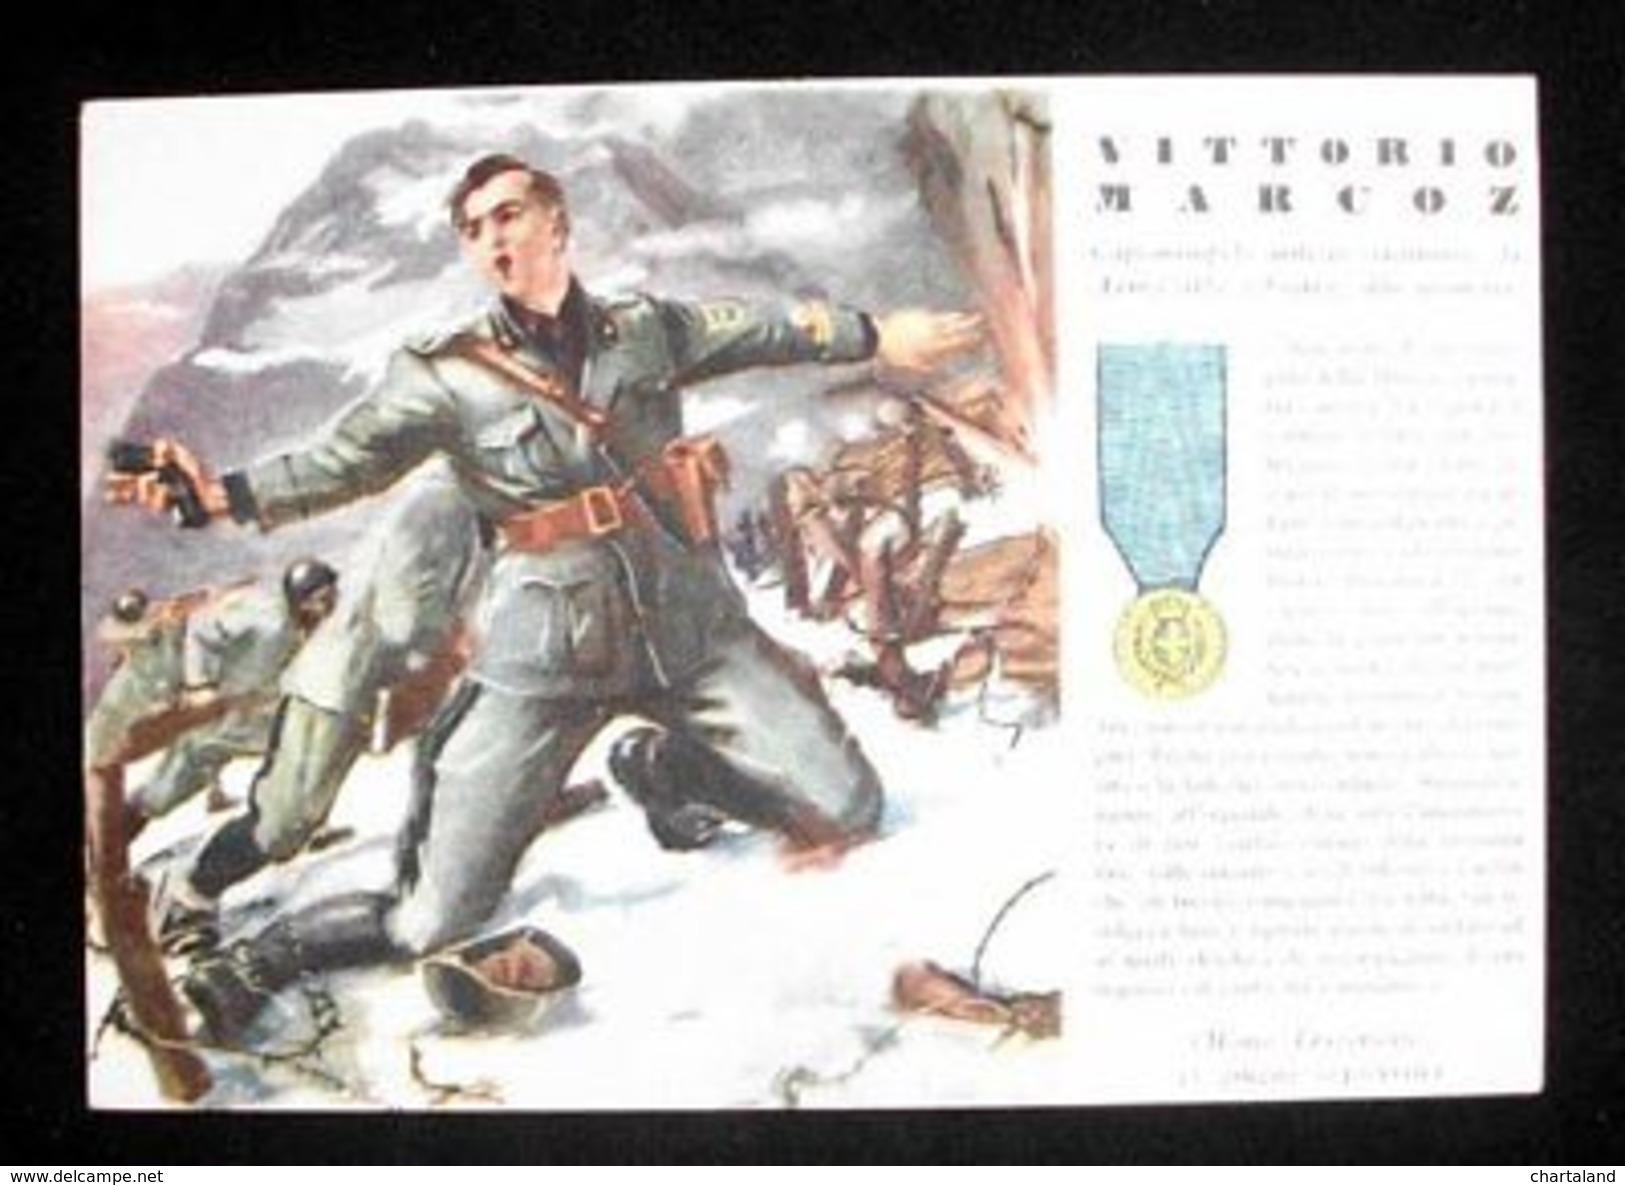 WWII Cartolina - Medaglie D' Oro Guerra 1940 - Marcoz - Altri